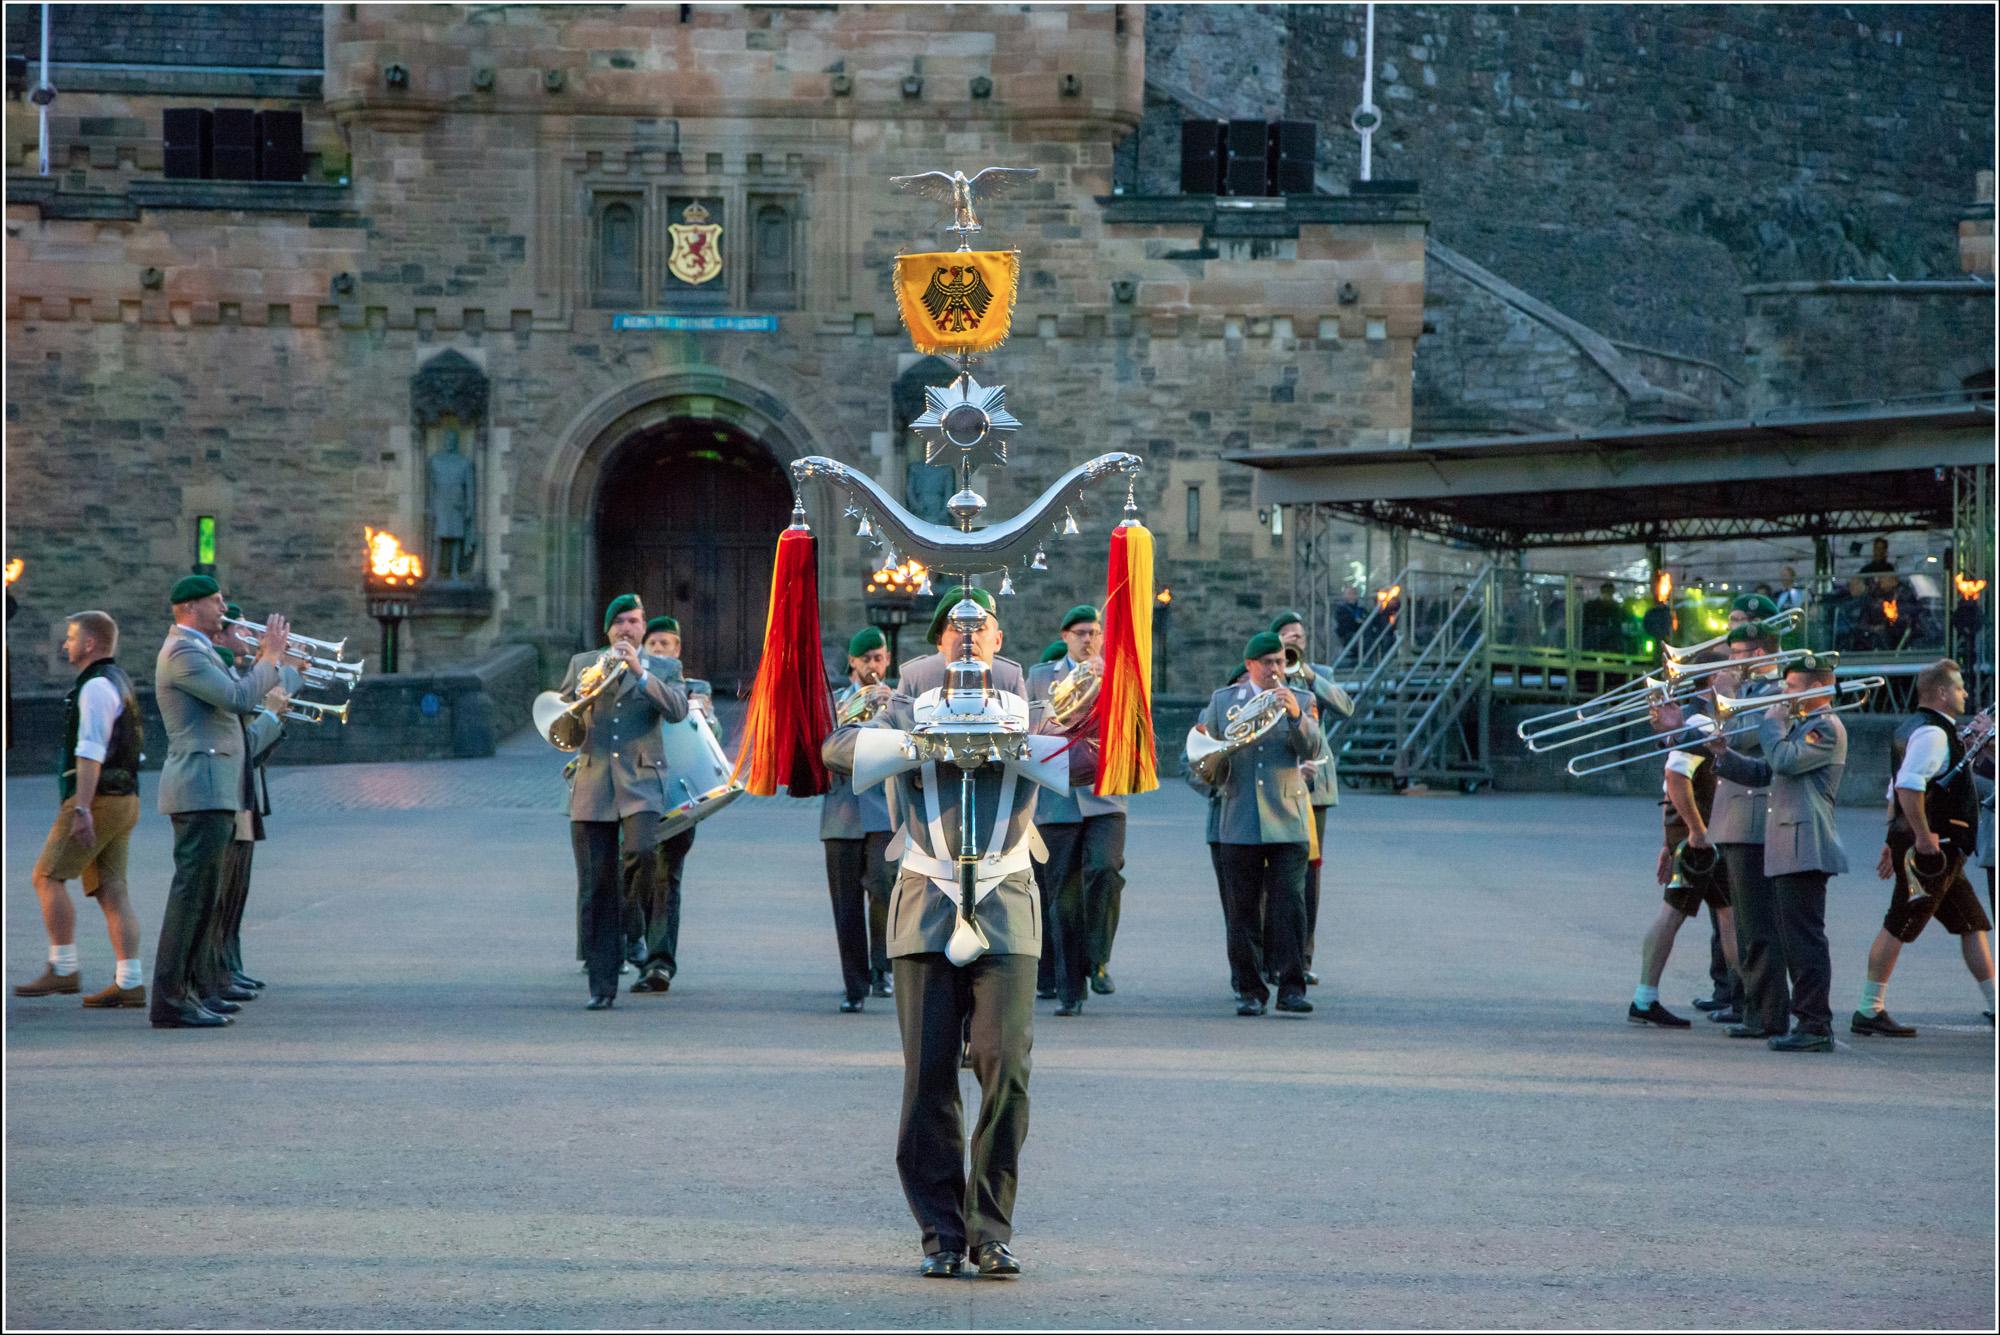 Heeresmusikkorps Kassel